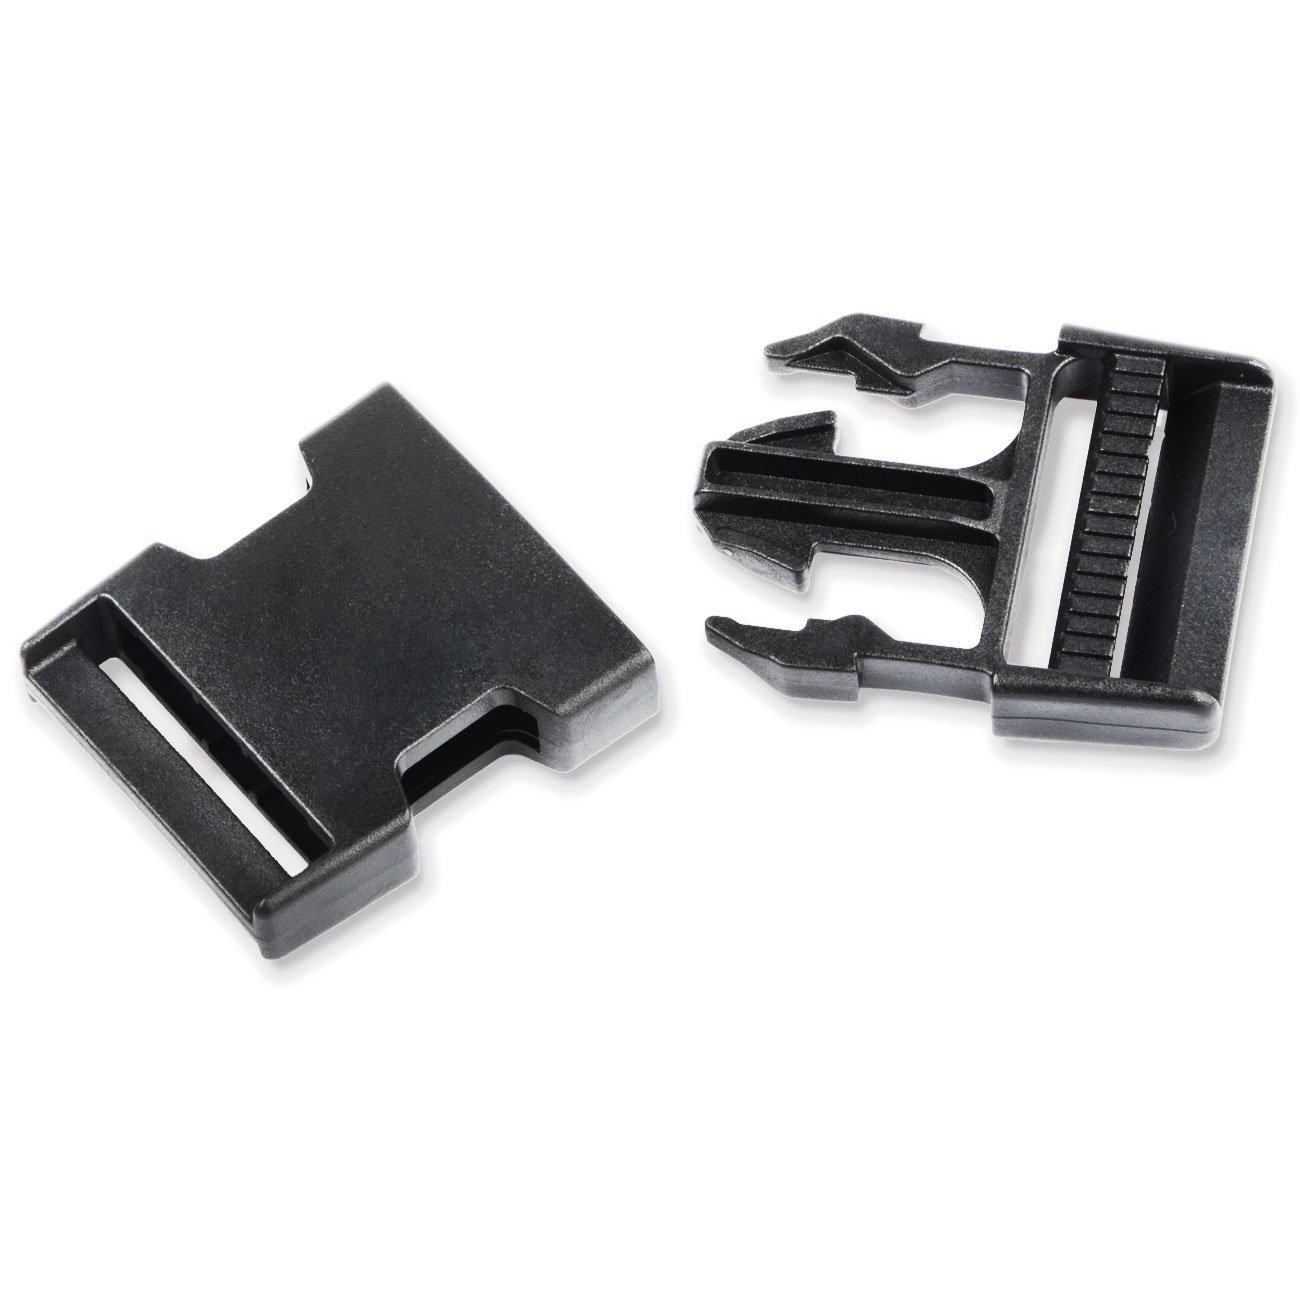 1-1//2 Inch 4pcs Multi-Size Dual Adjustable Buckles Plastic Flat Side Release Buckles